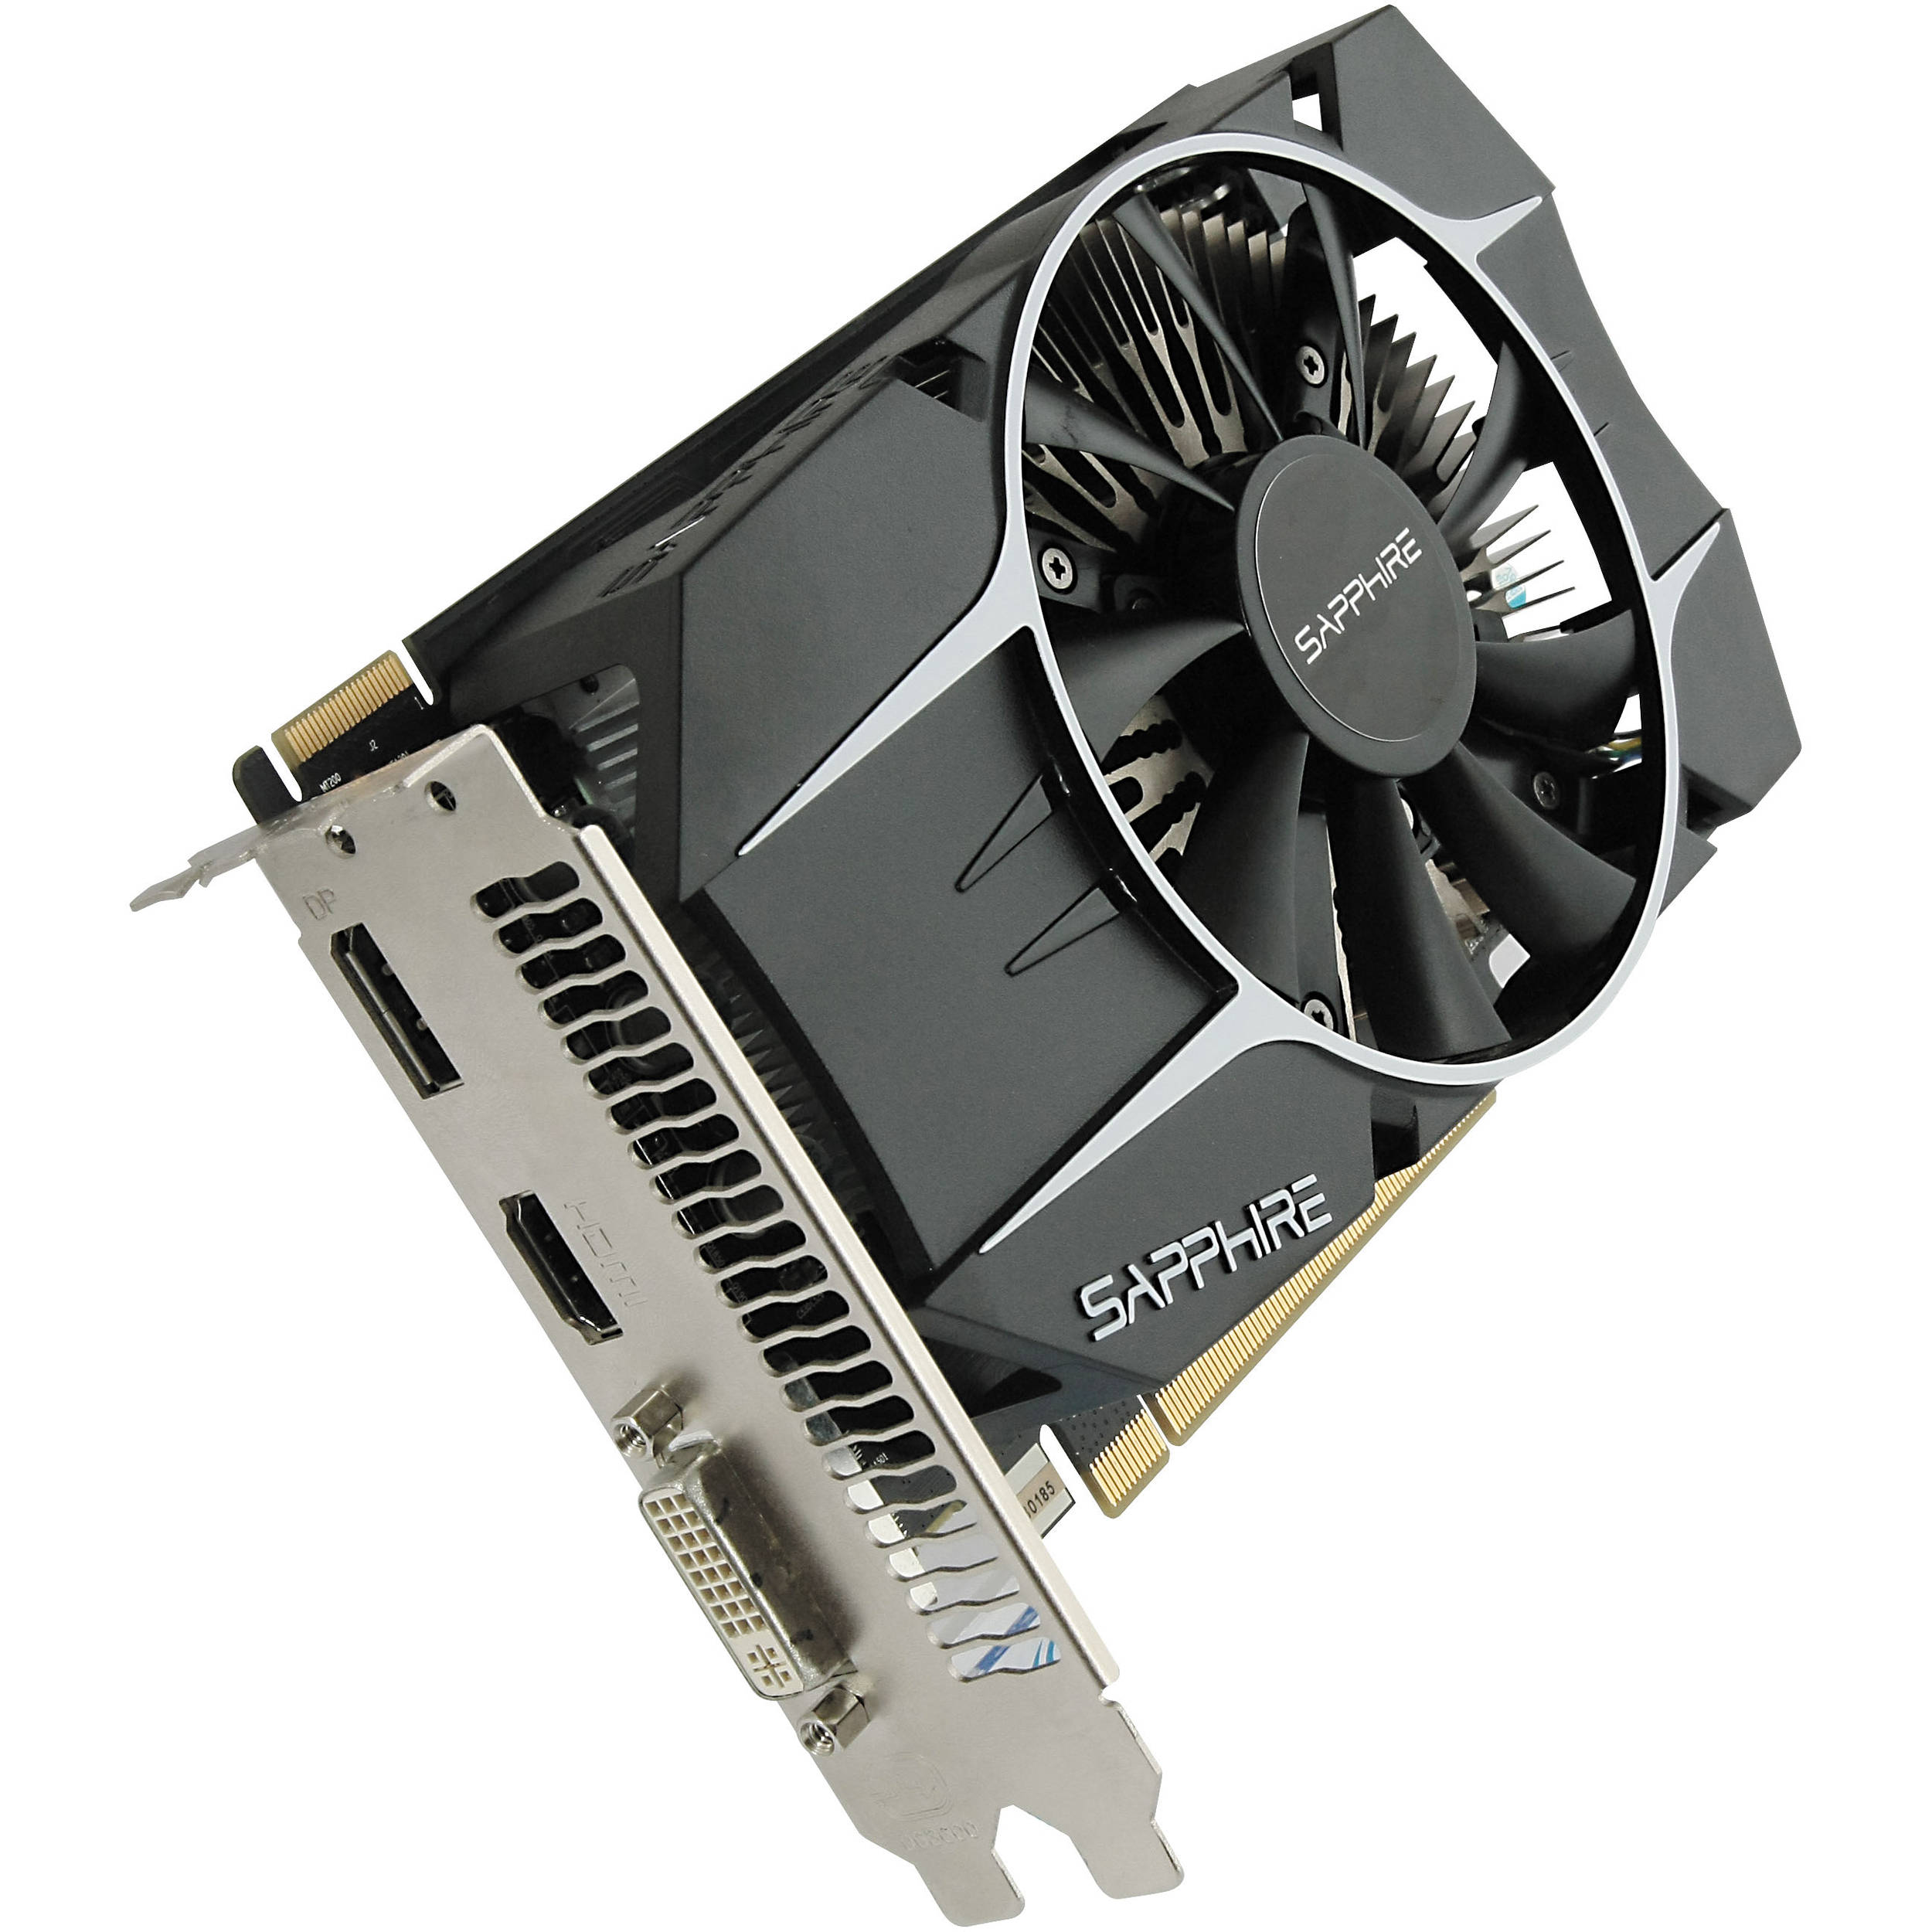 Sapphire Radeon R7 260X Graphics Card